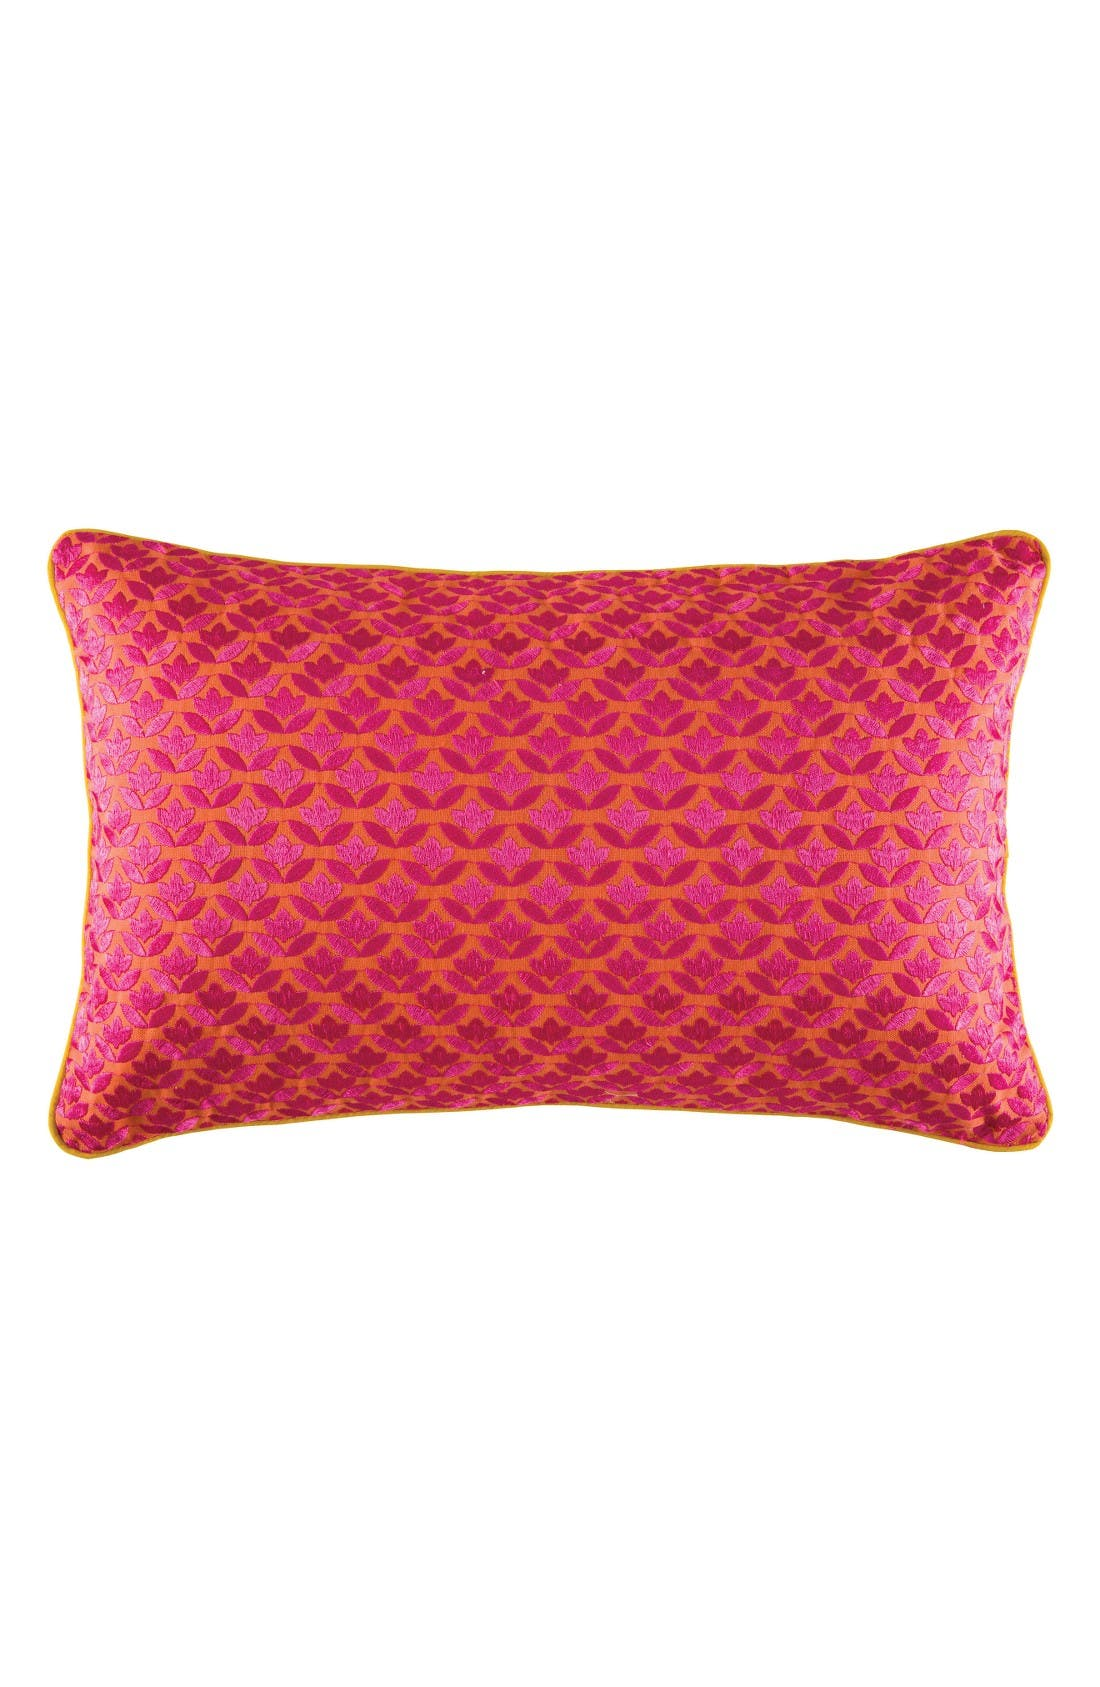 Alternate Image 1 Selected - KAS Designs Manasi Pillow